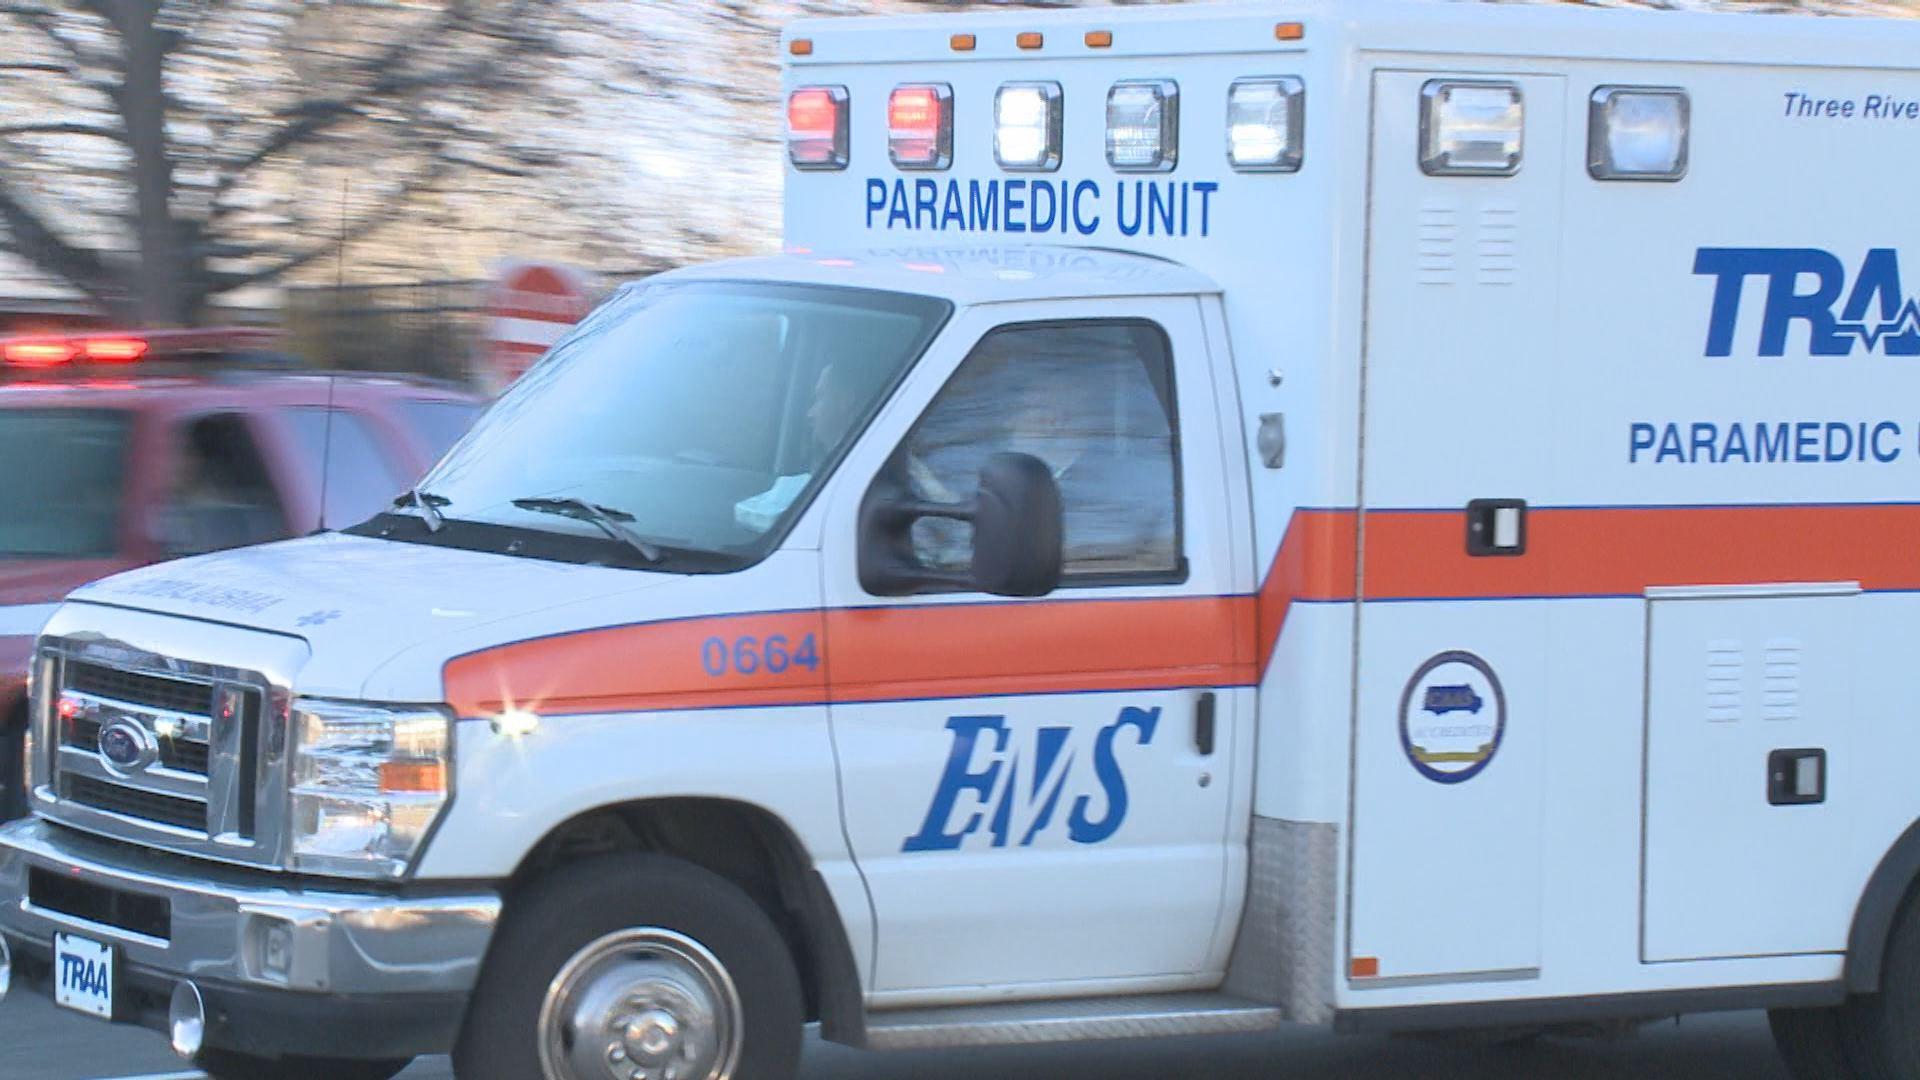 TRAA ambulance